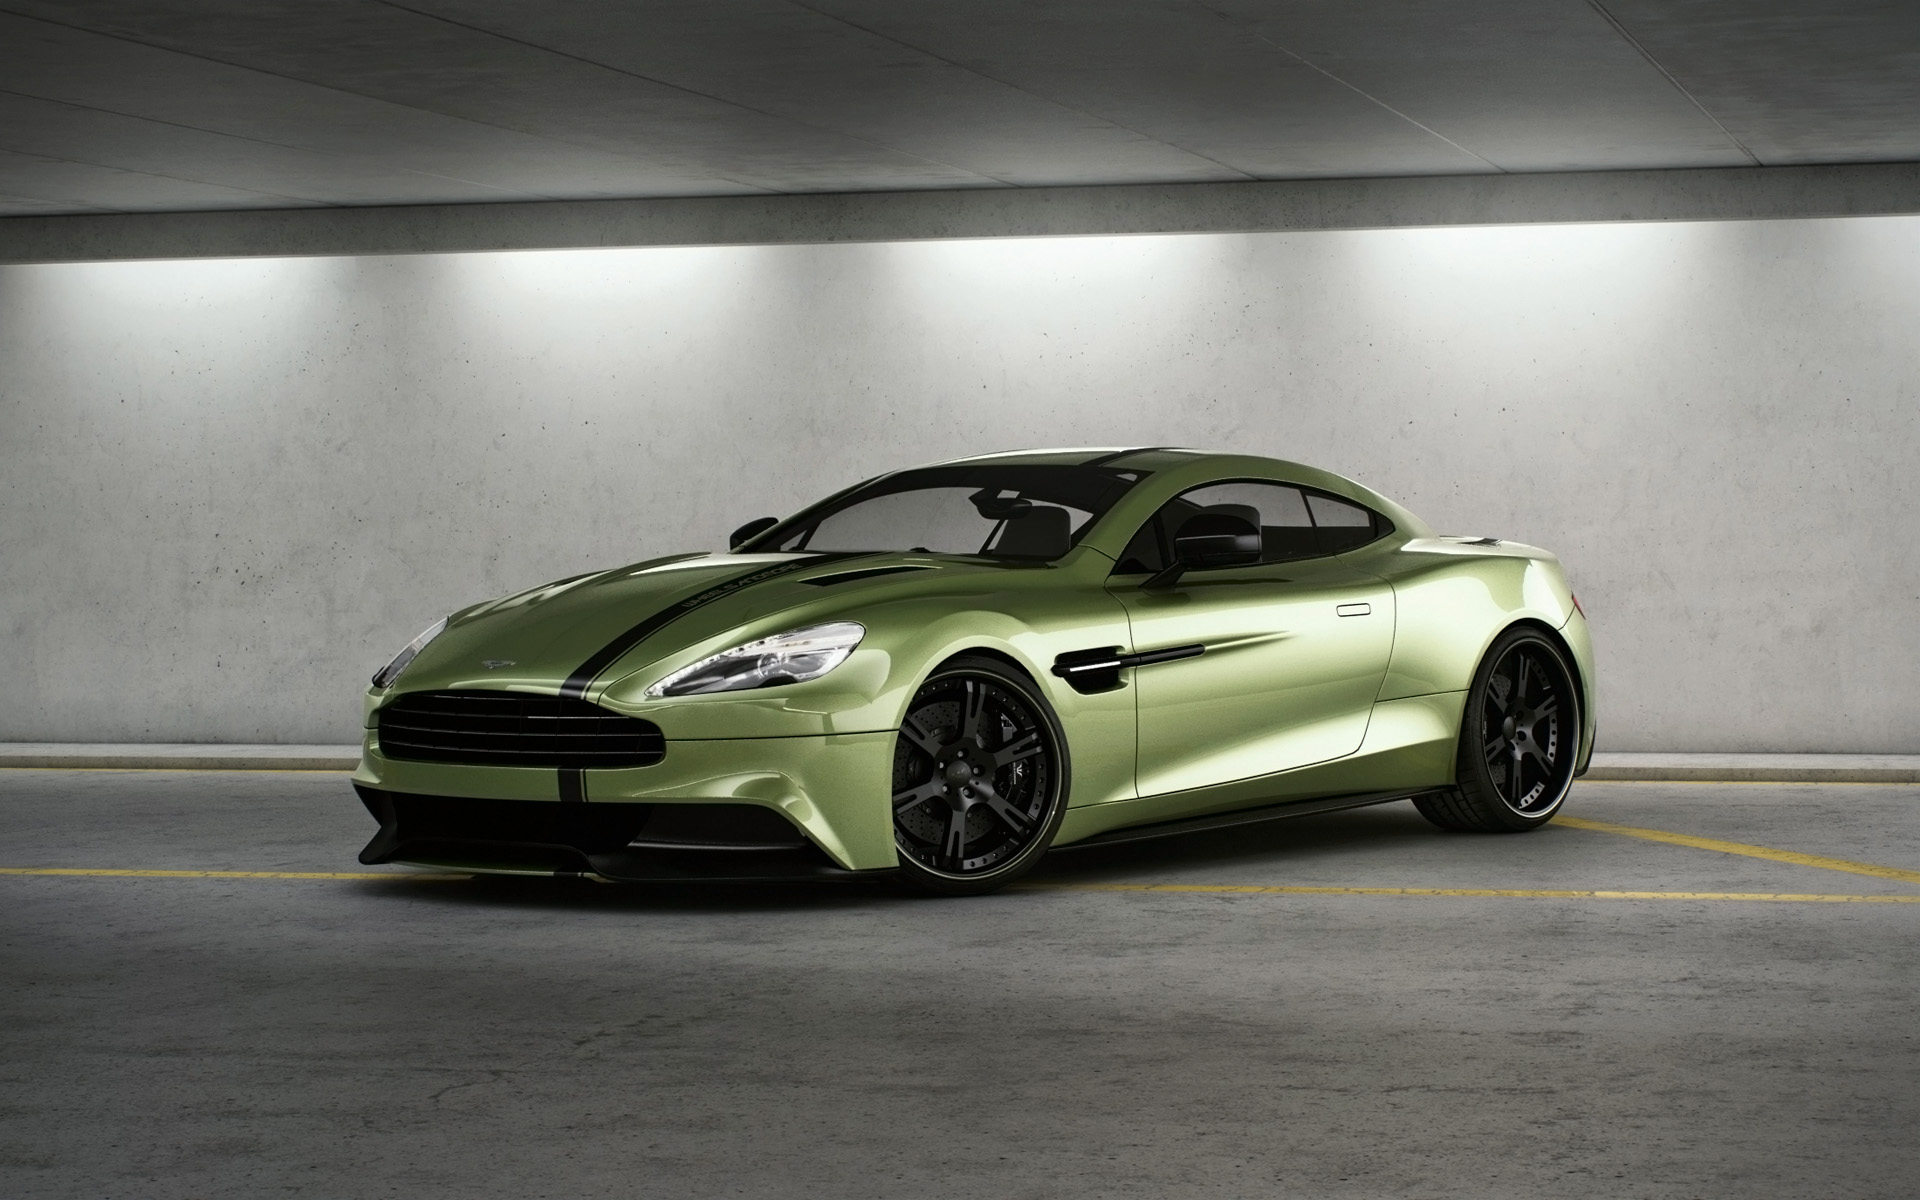 Aston Martin Vanquish green awesome